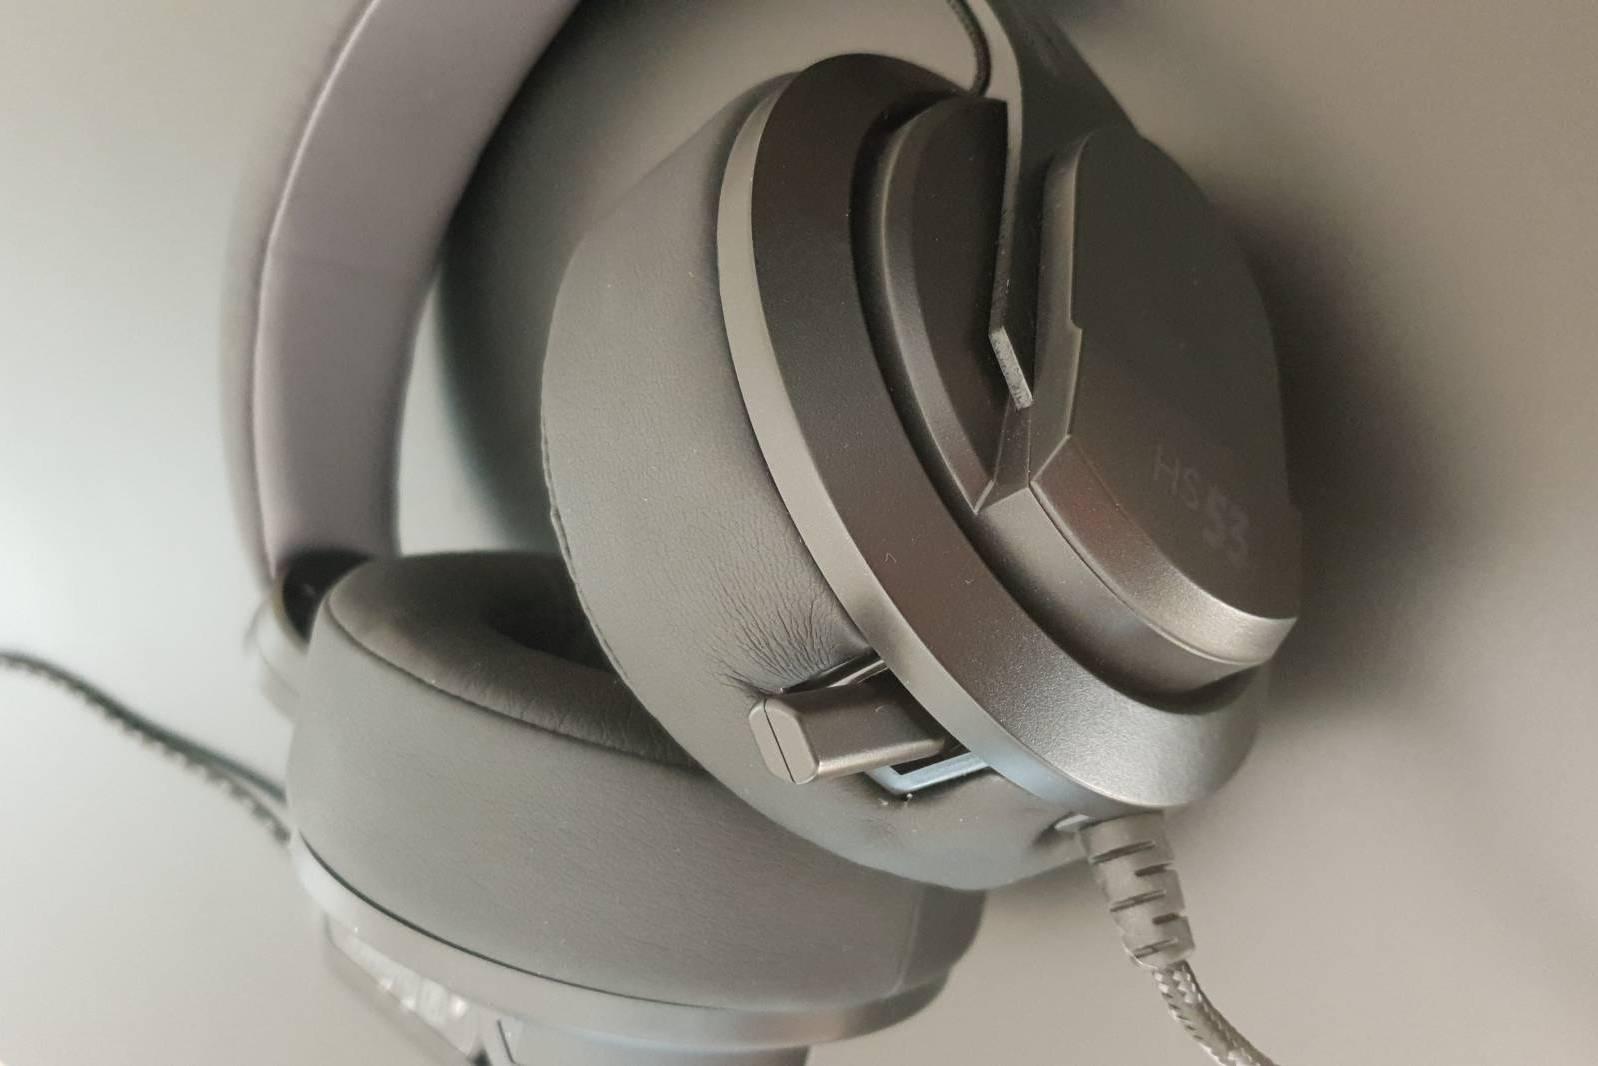 Image of Plugable headset